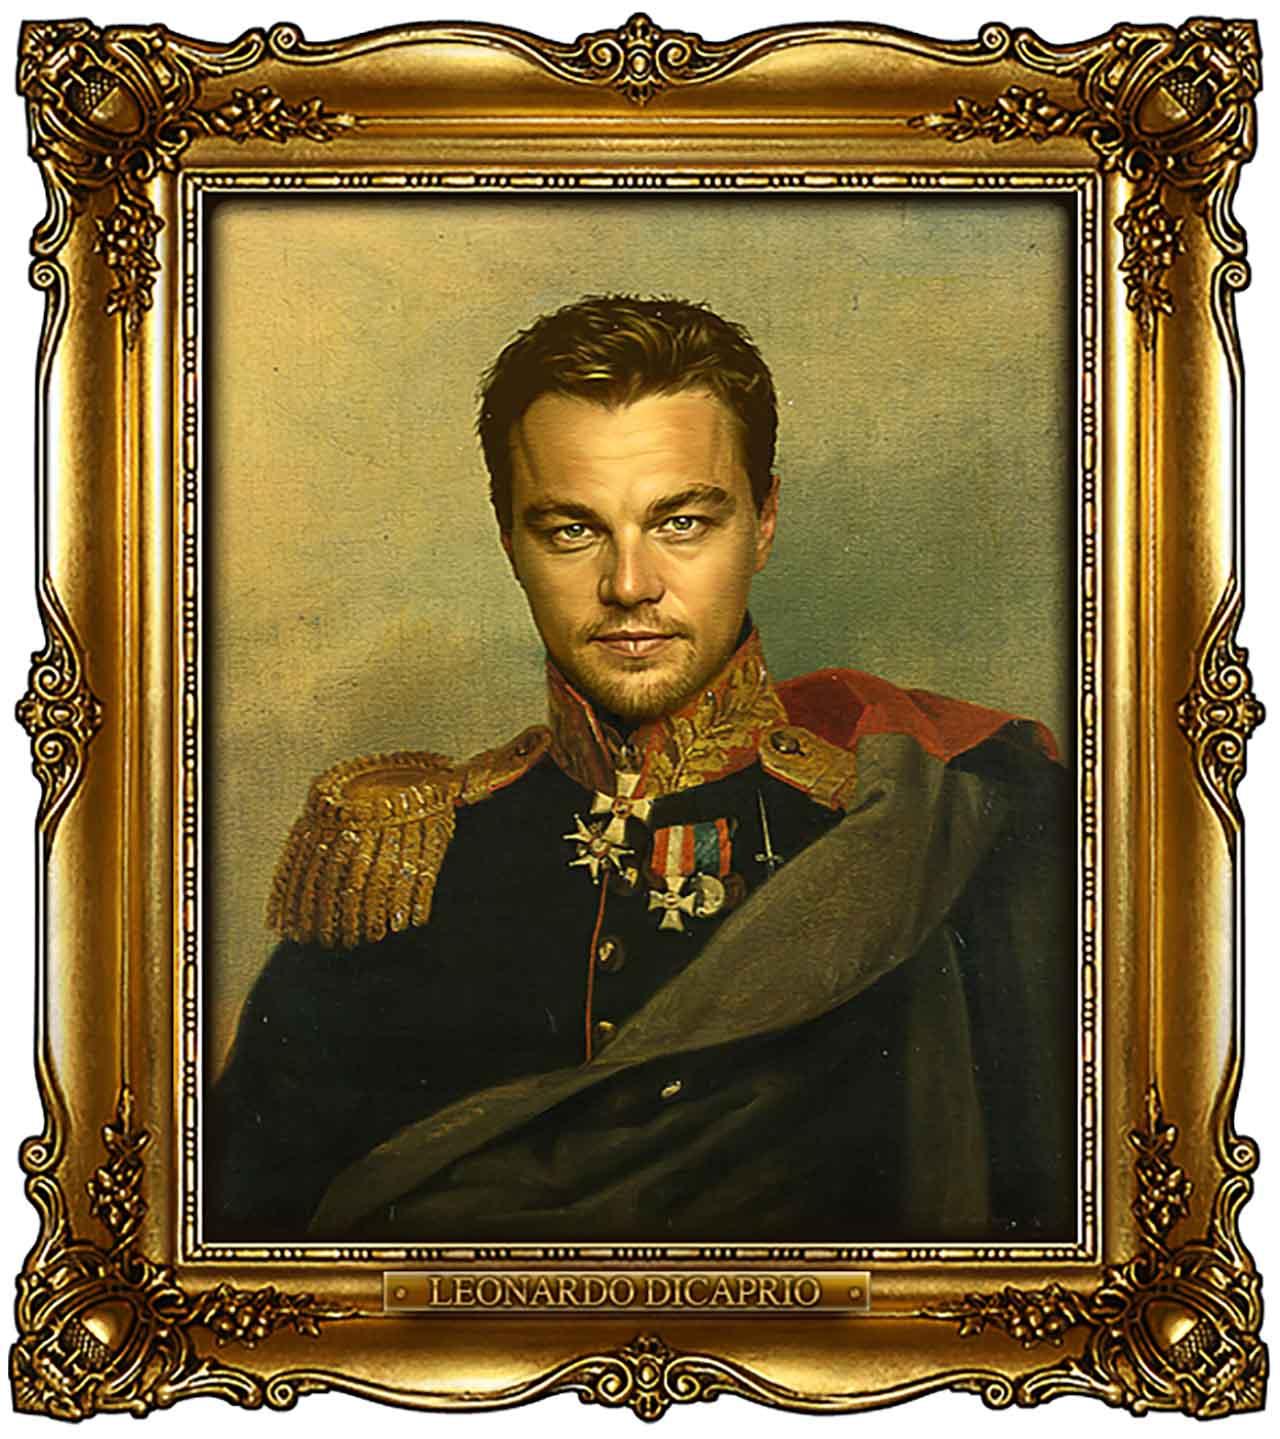 Artist Turns Famous Actors Into Russian Generals - Leonardo Dicaprio